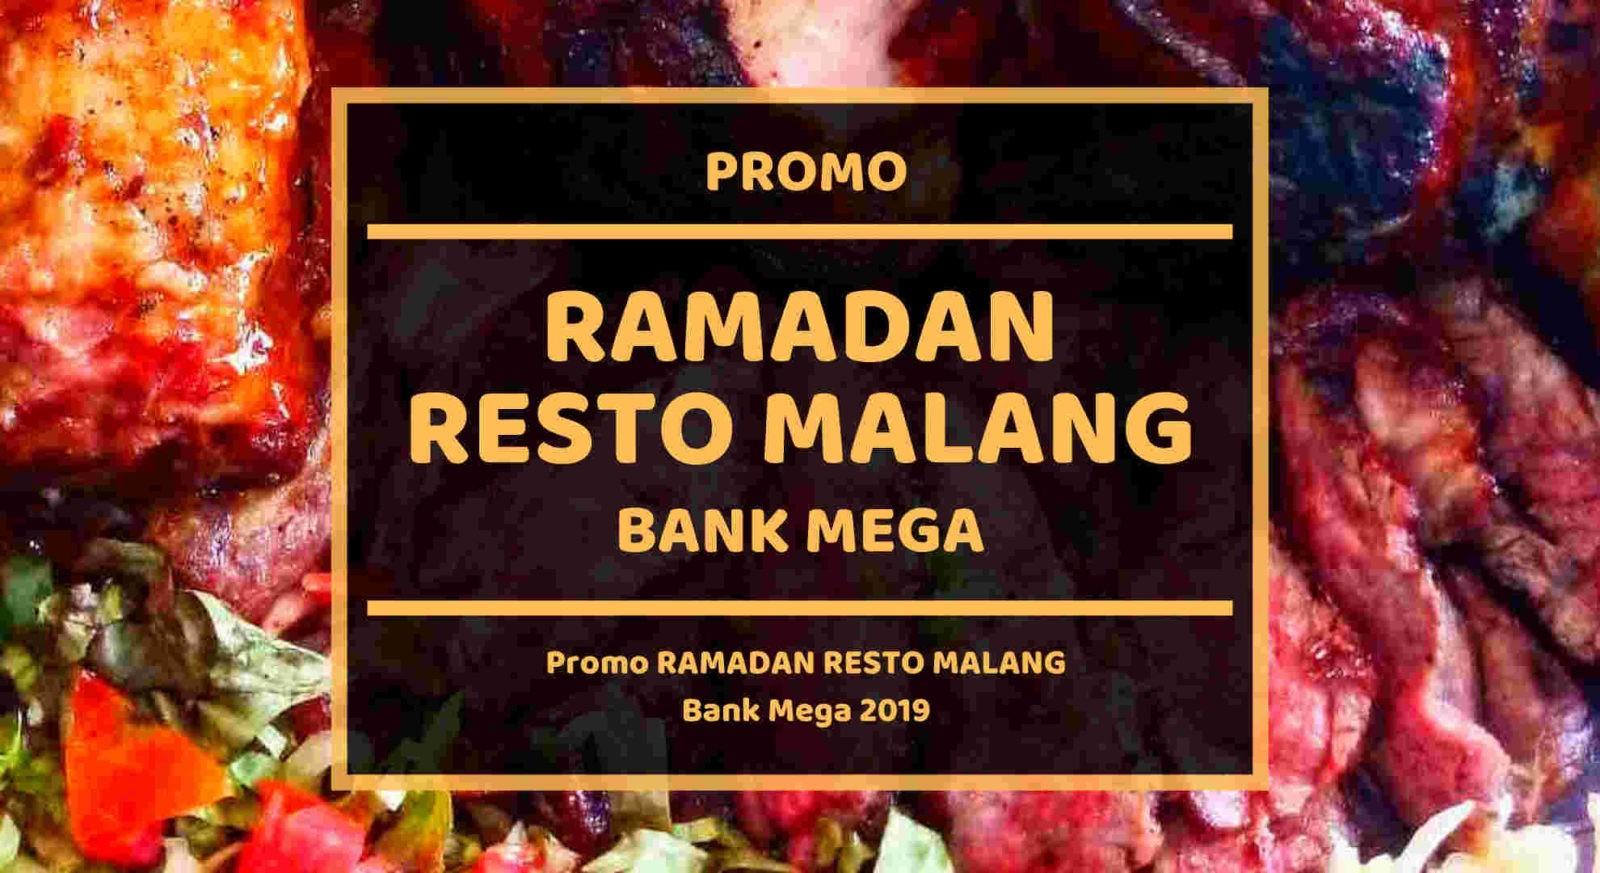 Promo Ramadan Resto Malang Bank Mega Disc Up To 25 Travelspromo